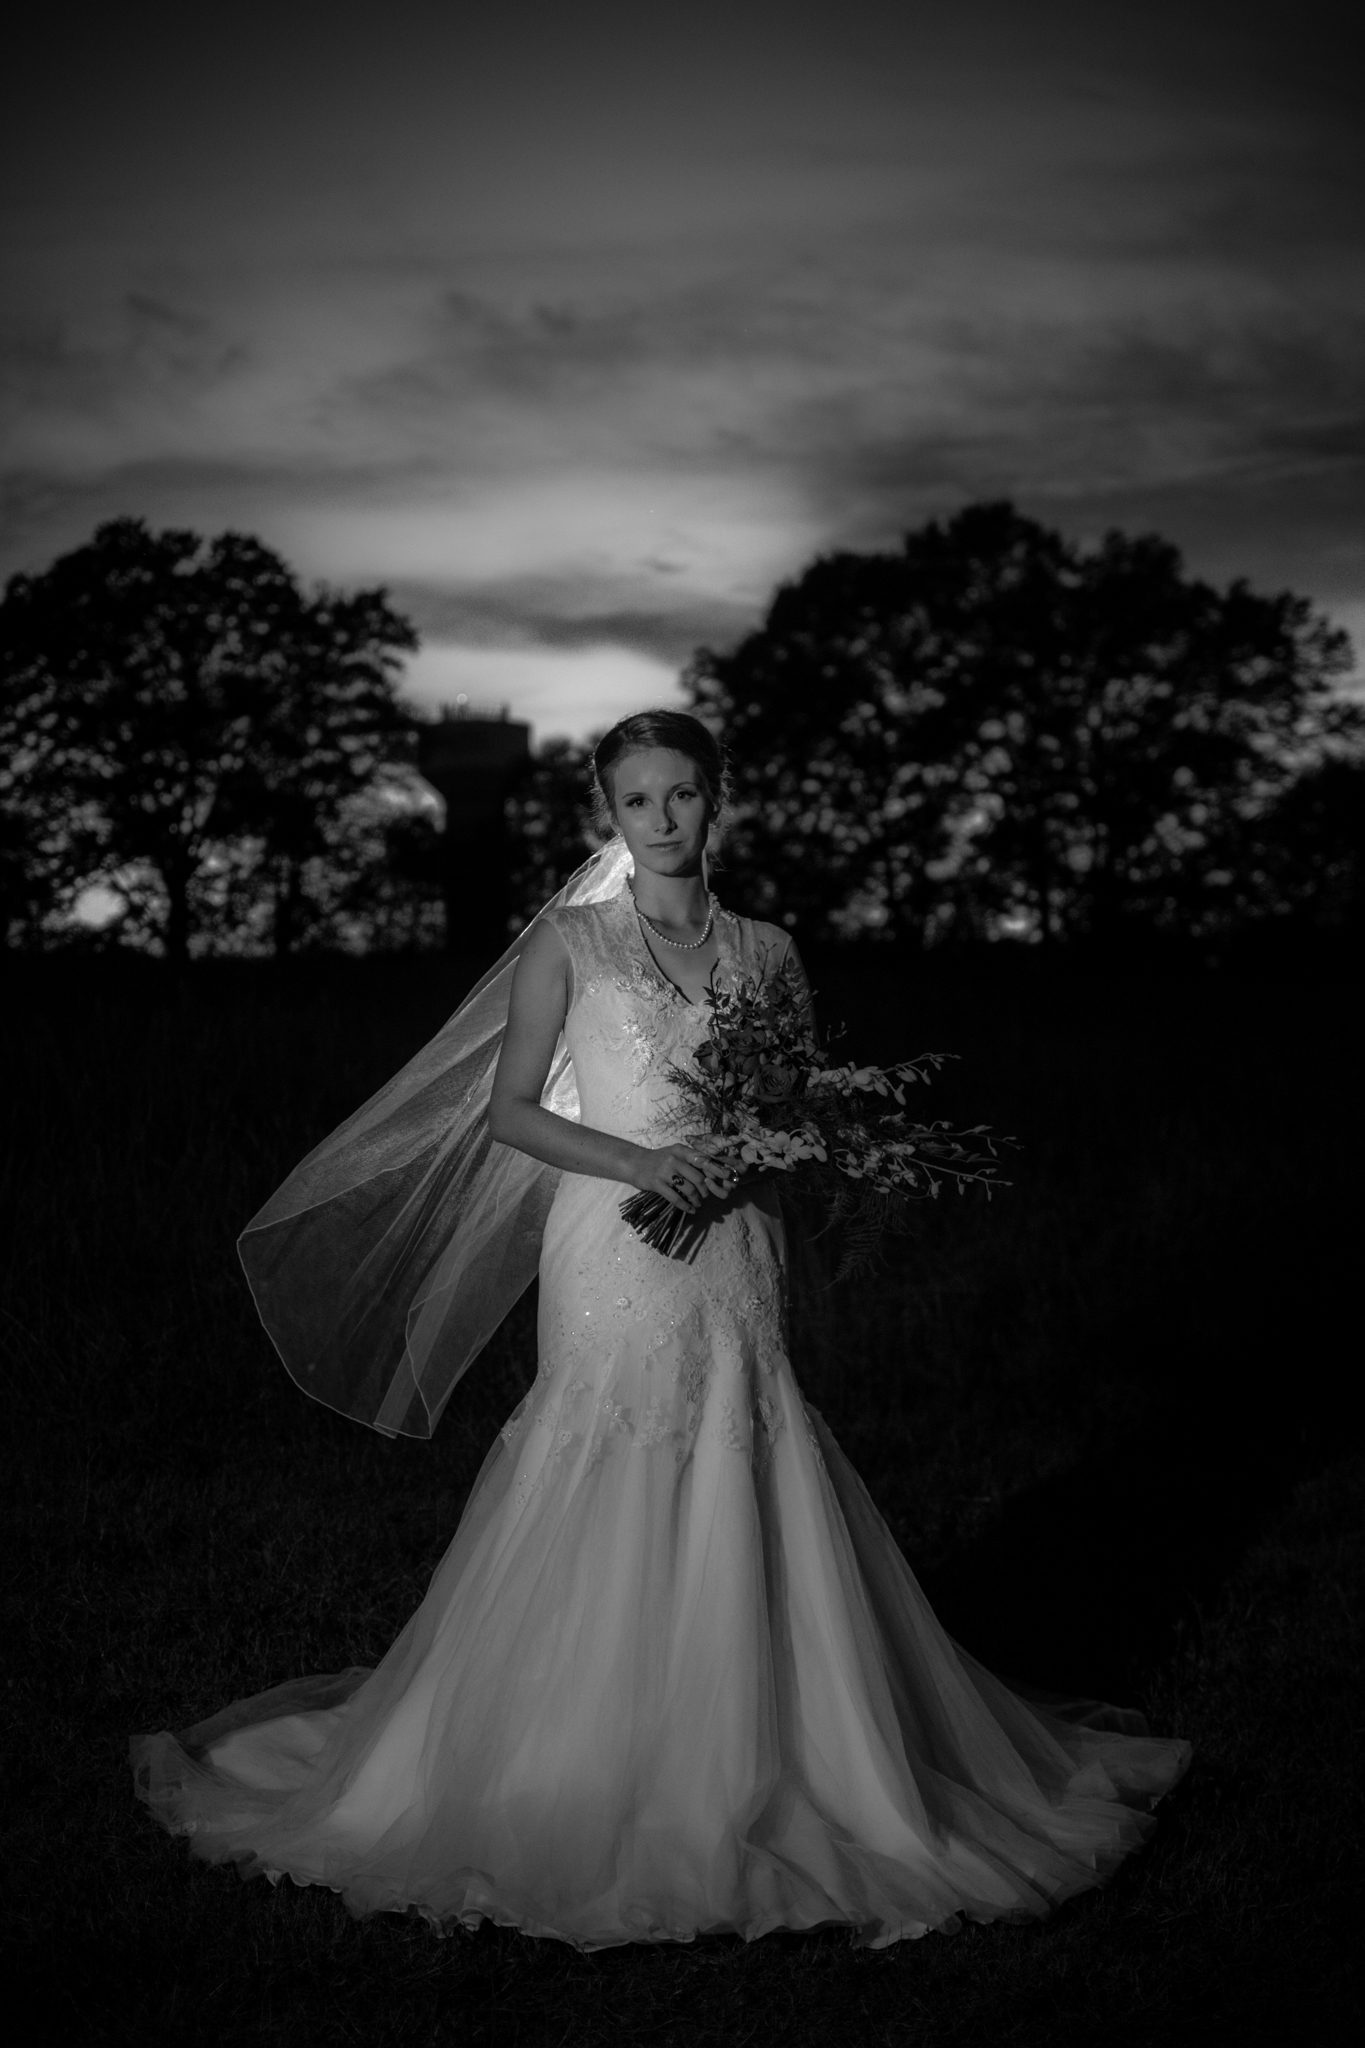 bridalportraits (49 of 49).JPG